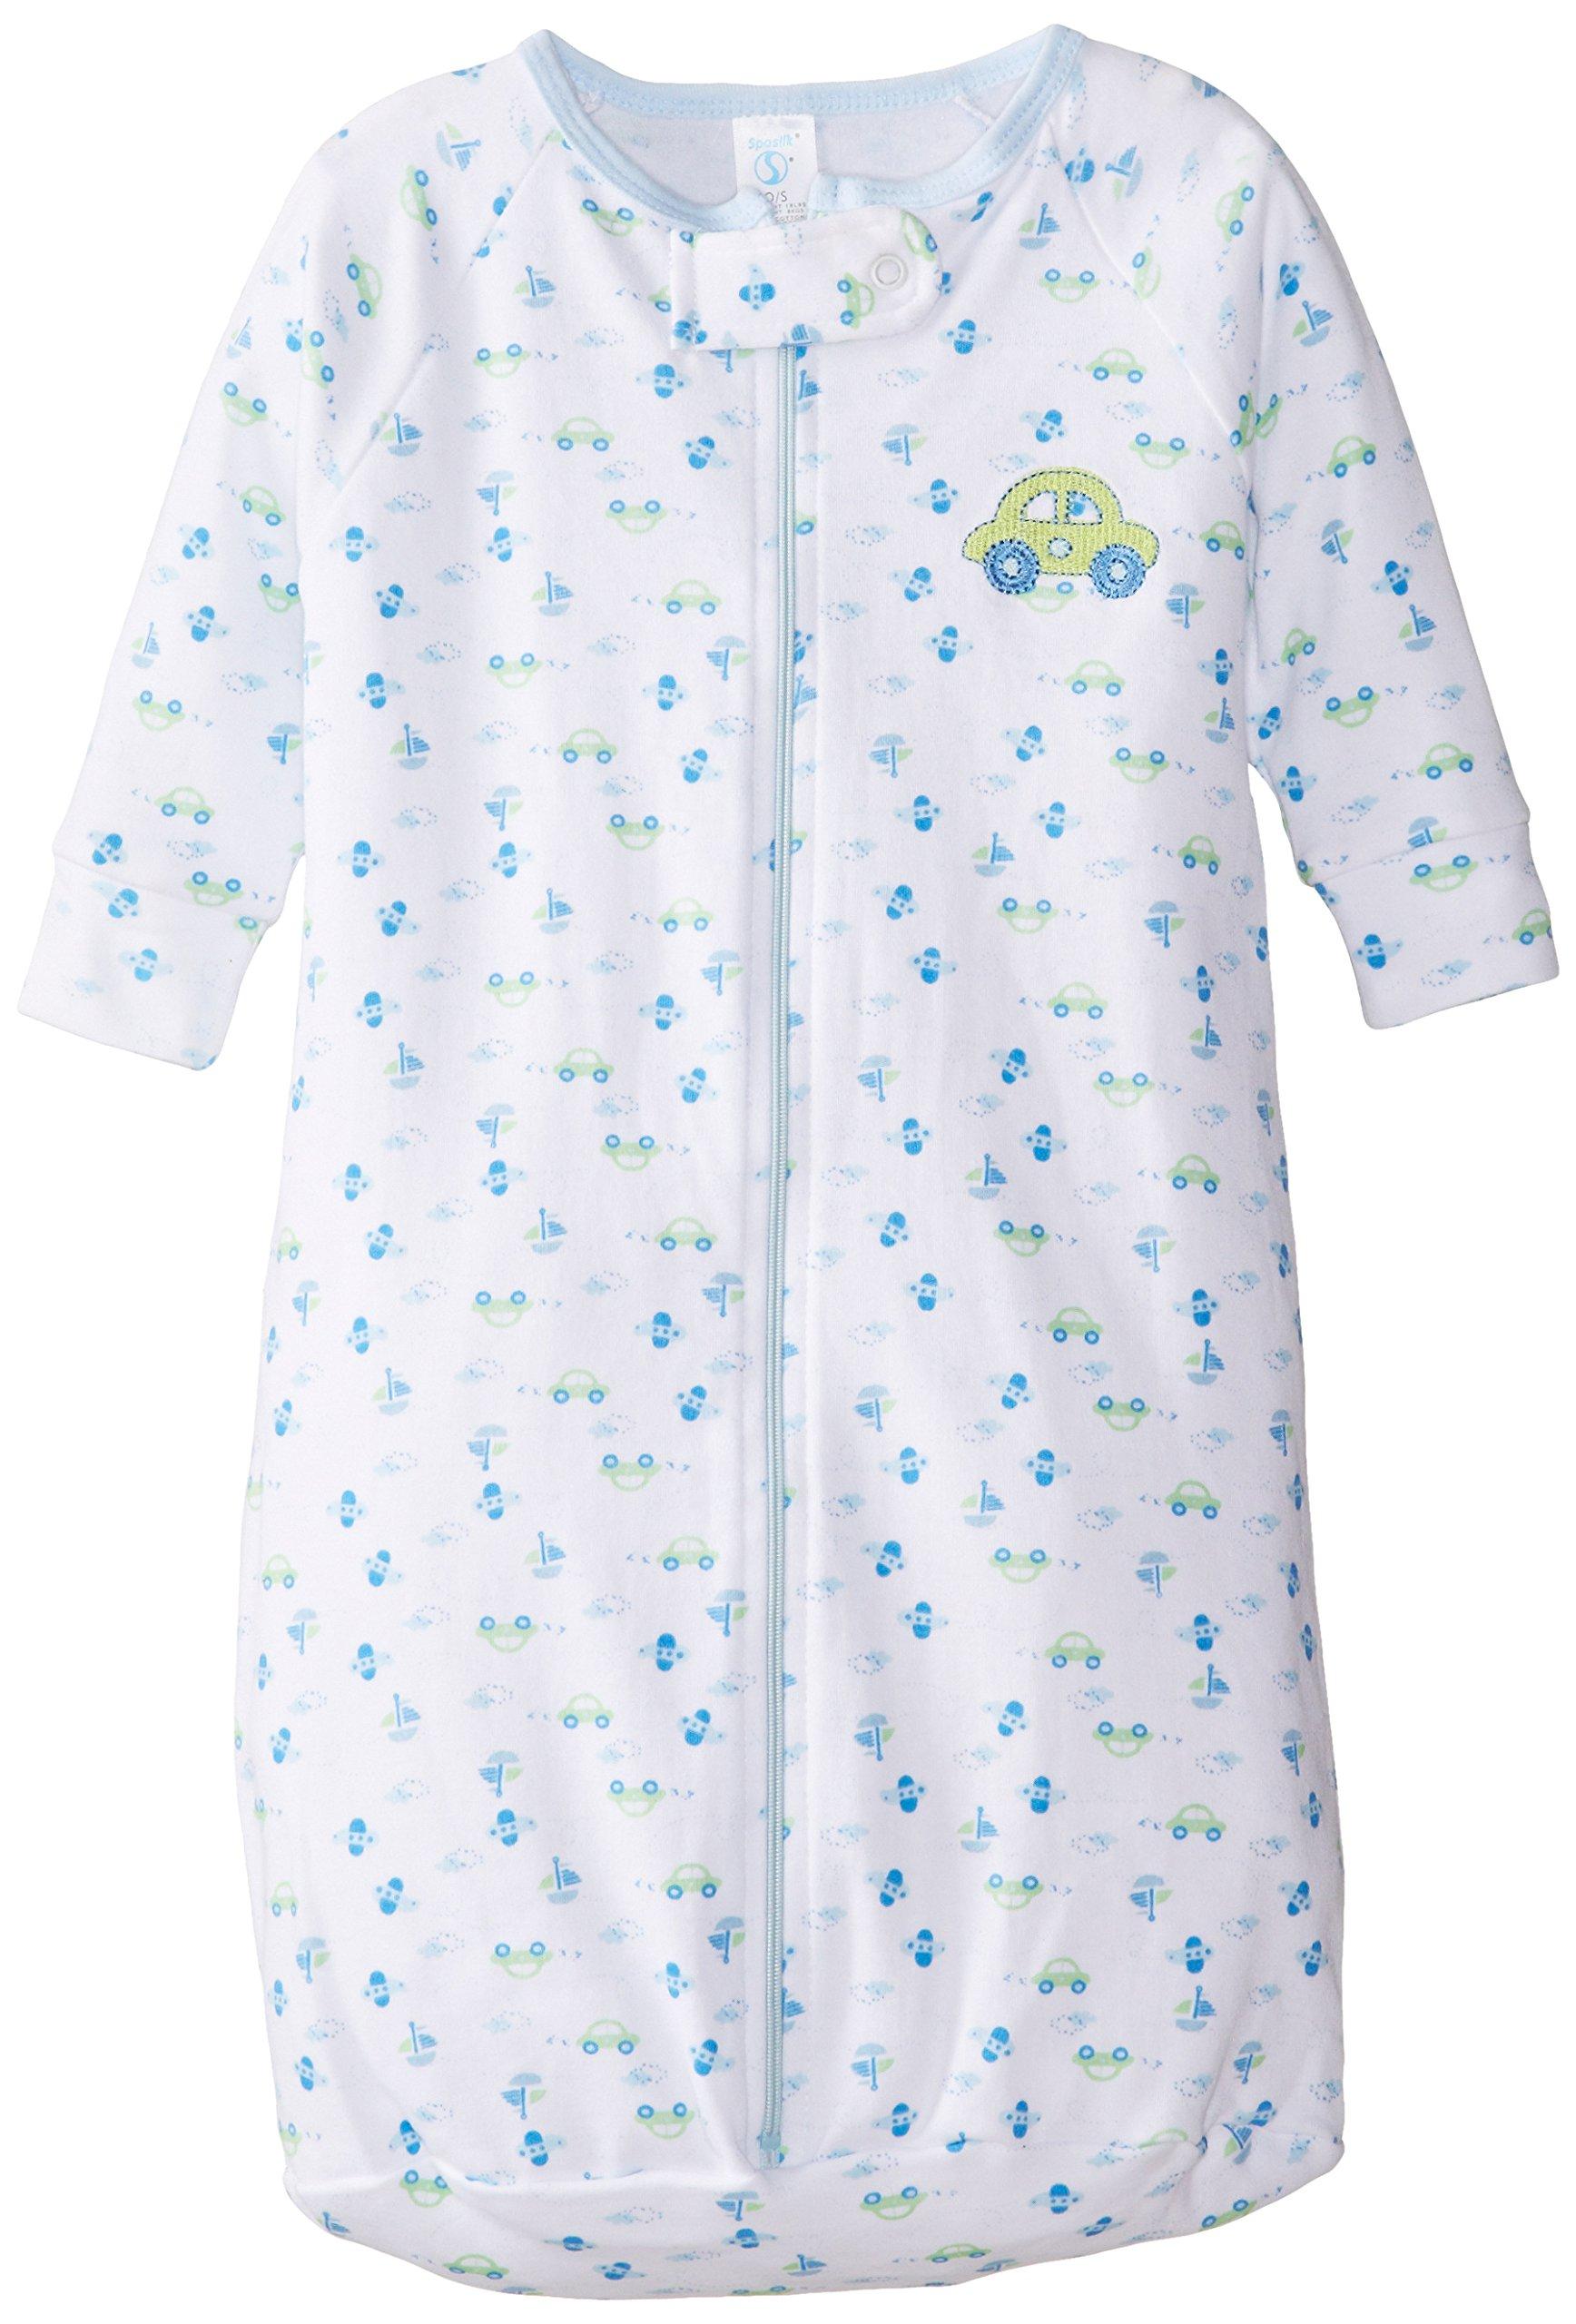 Amazon Com Hudson Baby Baby Long Sleeve Cotton Safe